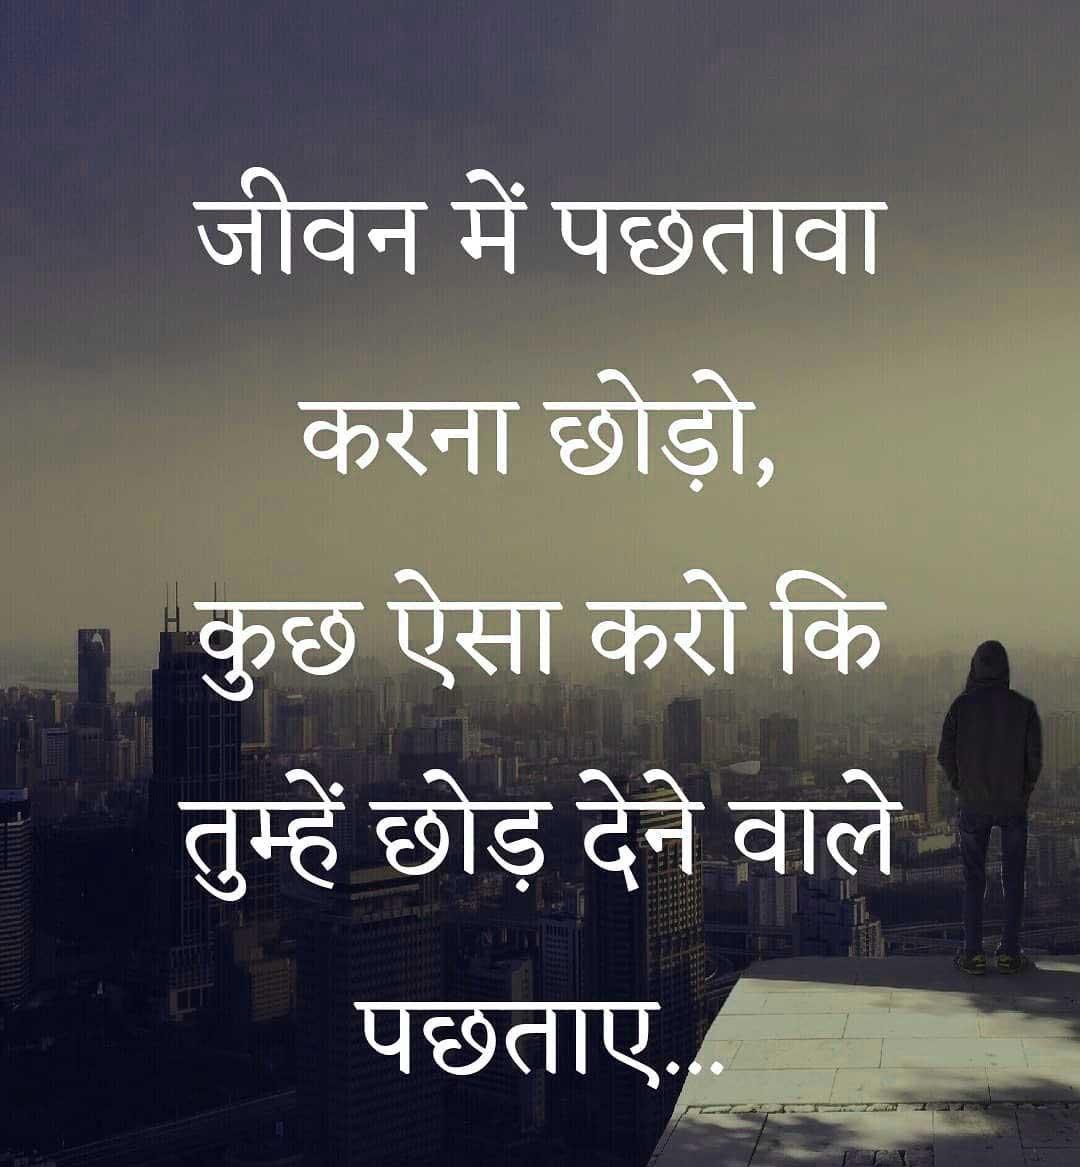 New Hindi Quotes Whatsapp DP Images